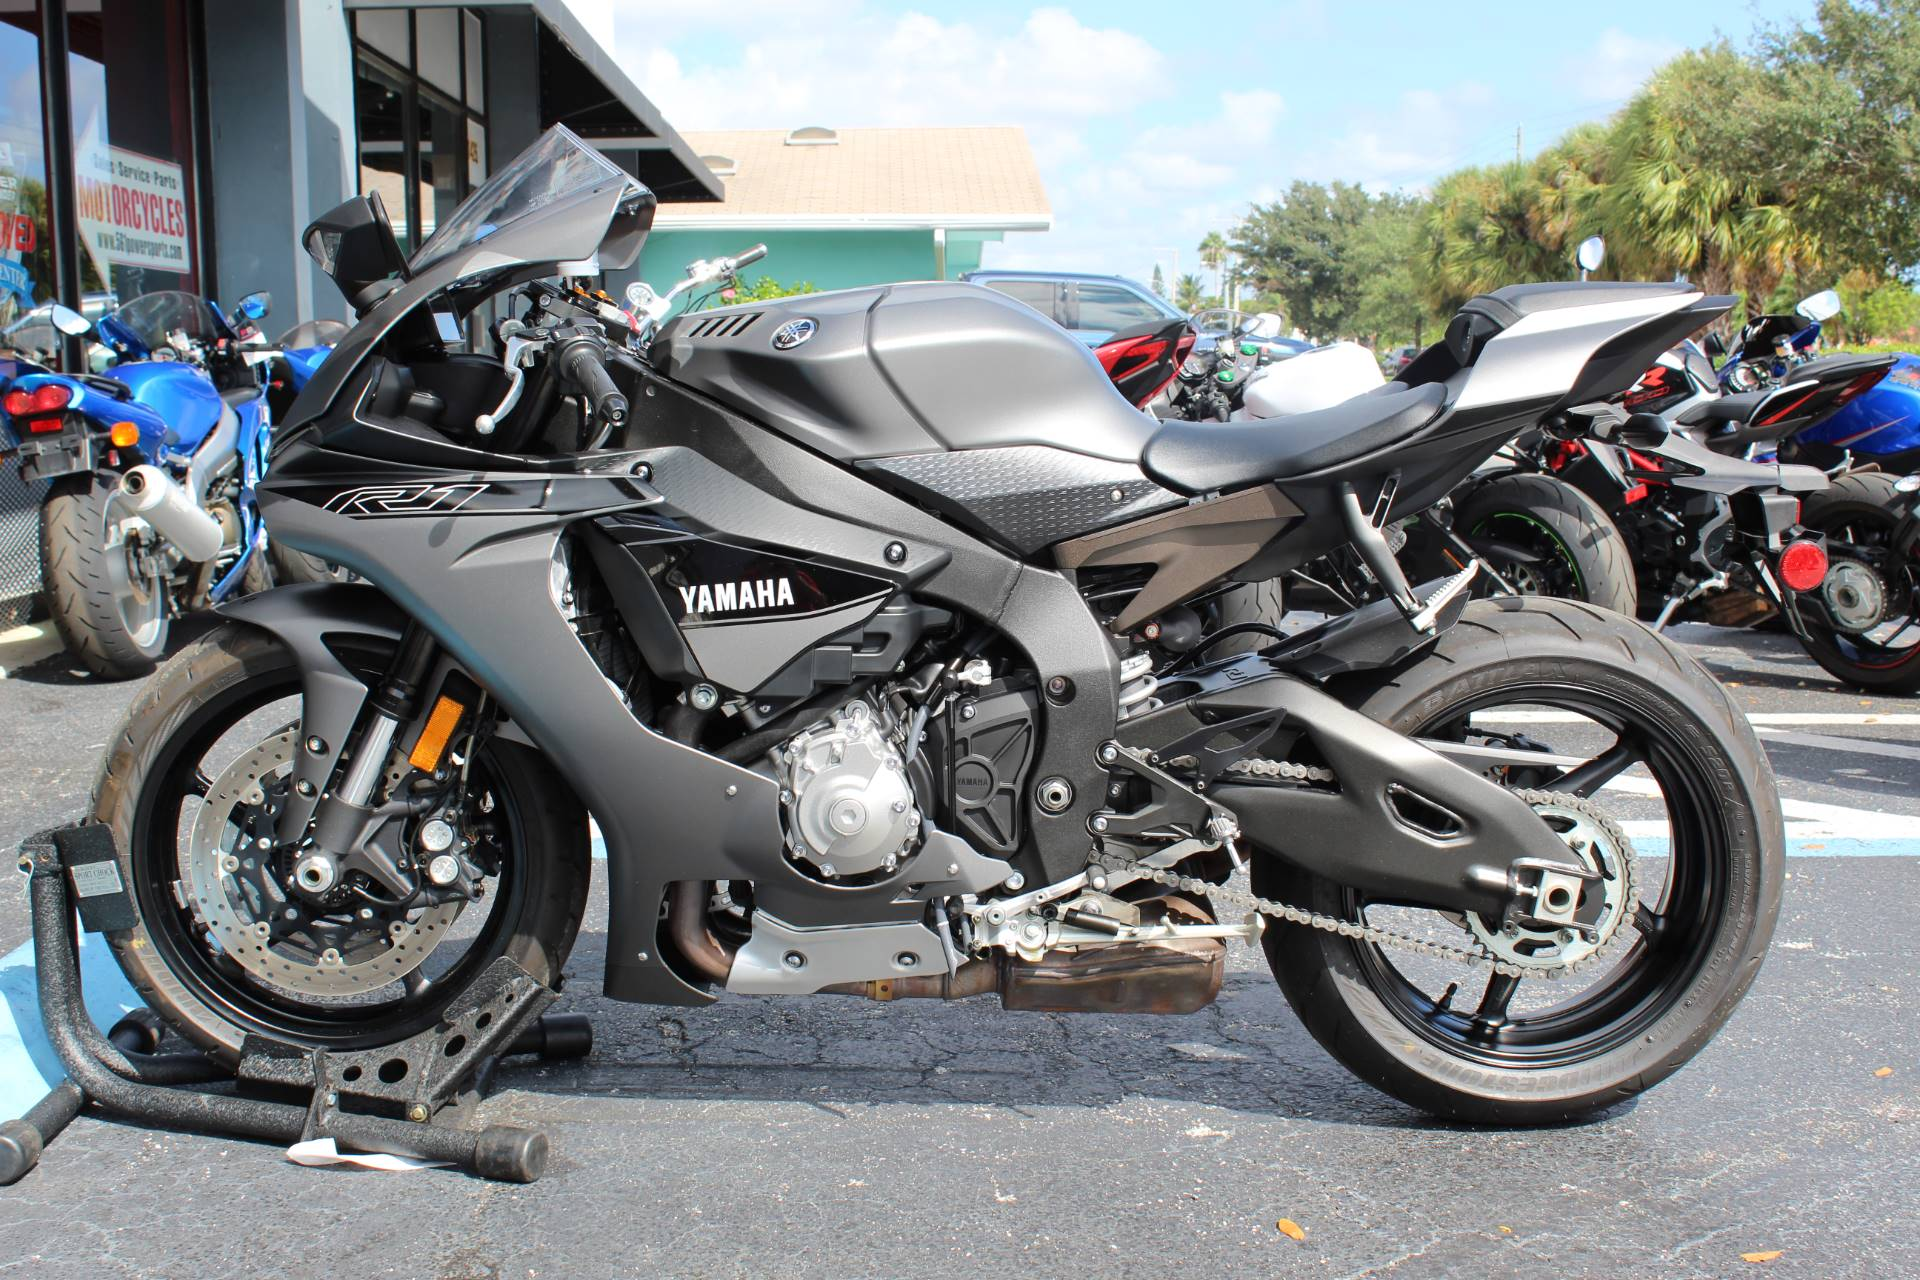 2016 Yamaha YZF-R1S 1